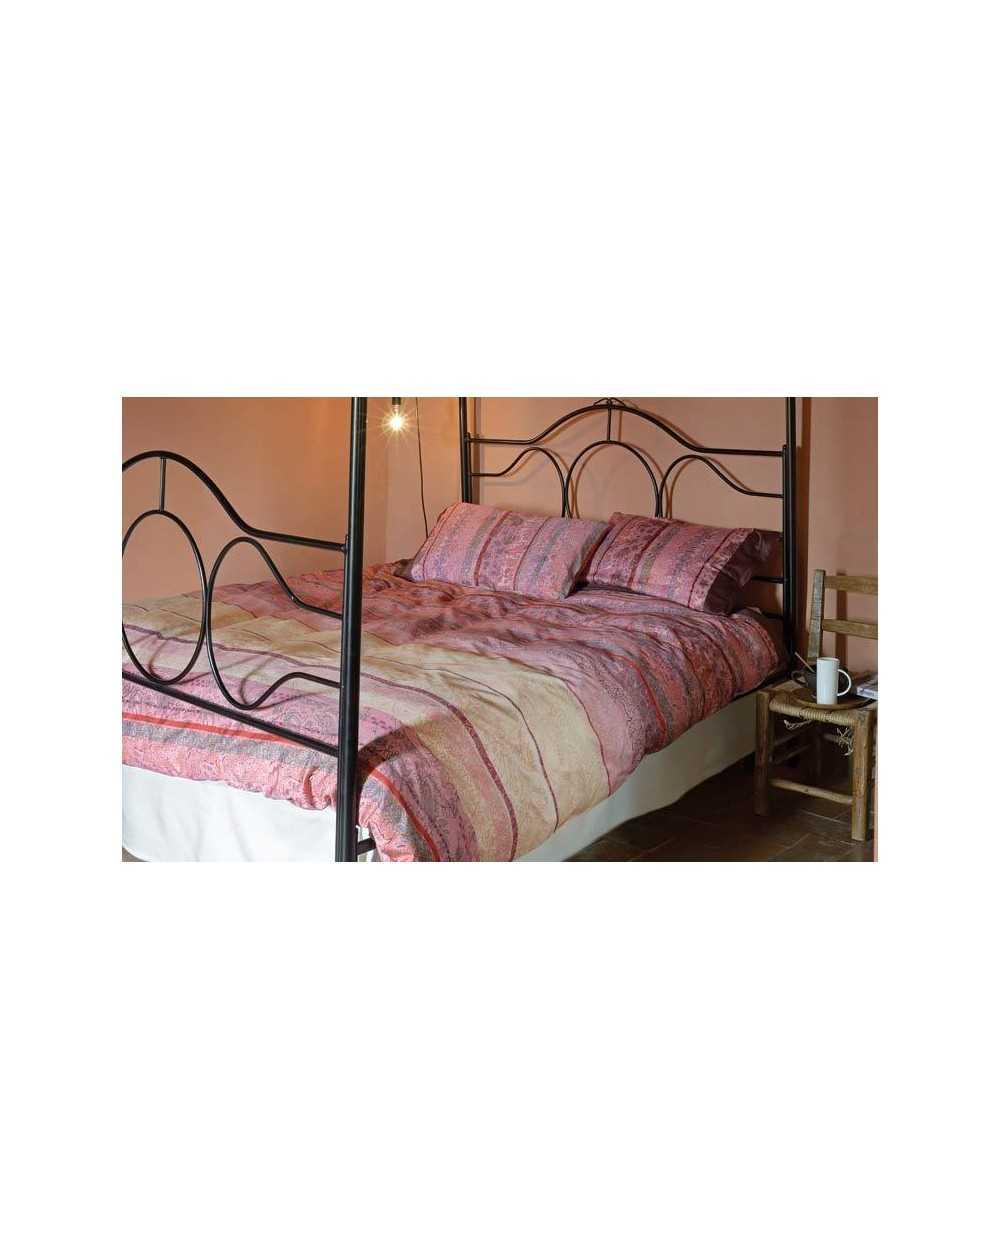 housse de couette granfoulard bassetti montalcino rasoline l f d home. Black Bedroom Furniture Sets. Home Design Ideas